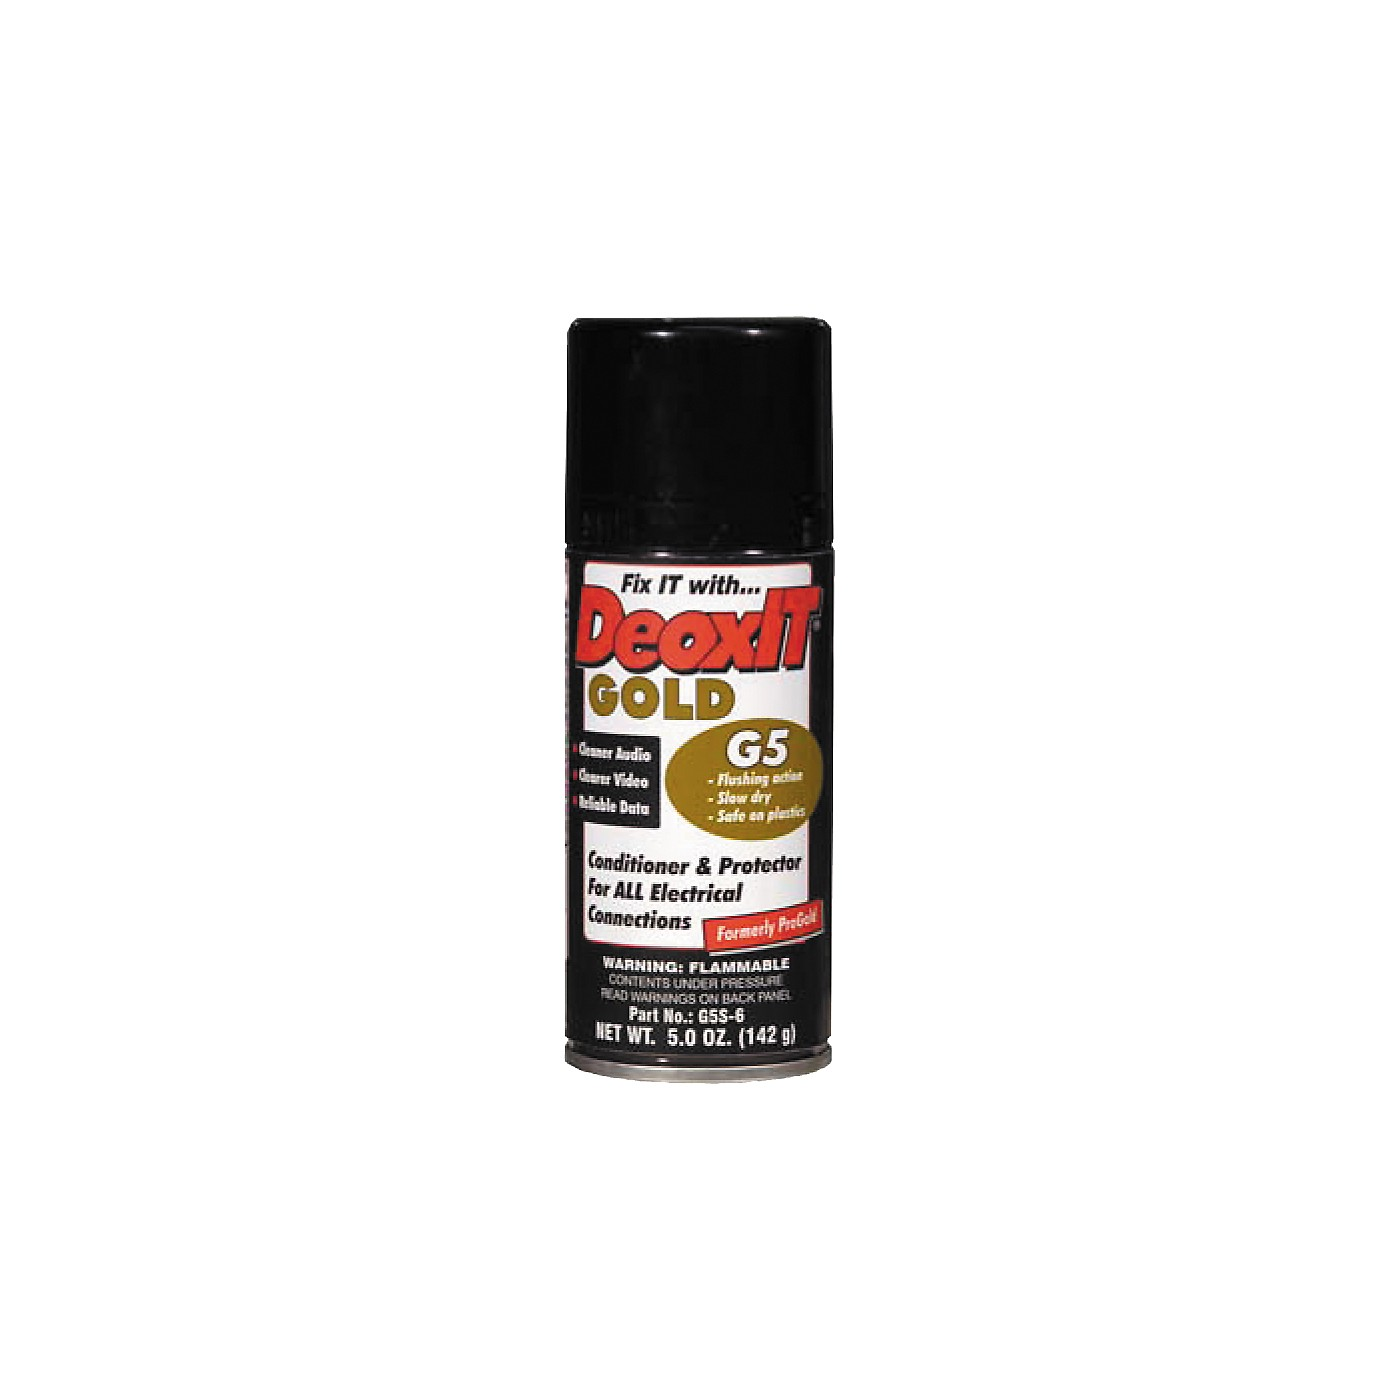 CAIG DeoxIT Gold G5 Spray Contact Conditioner 5 oz. thumbnail